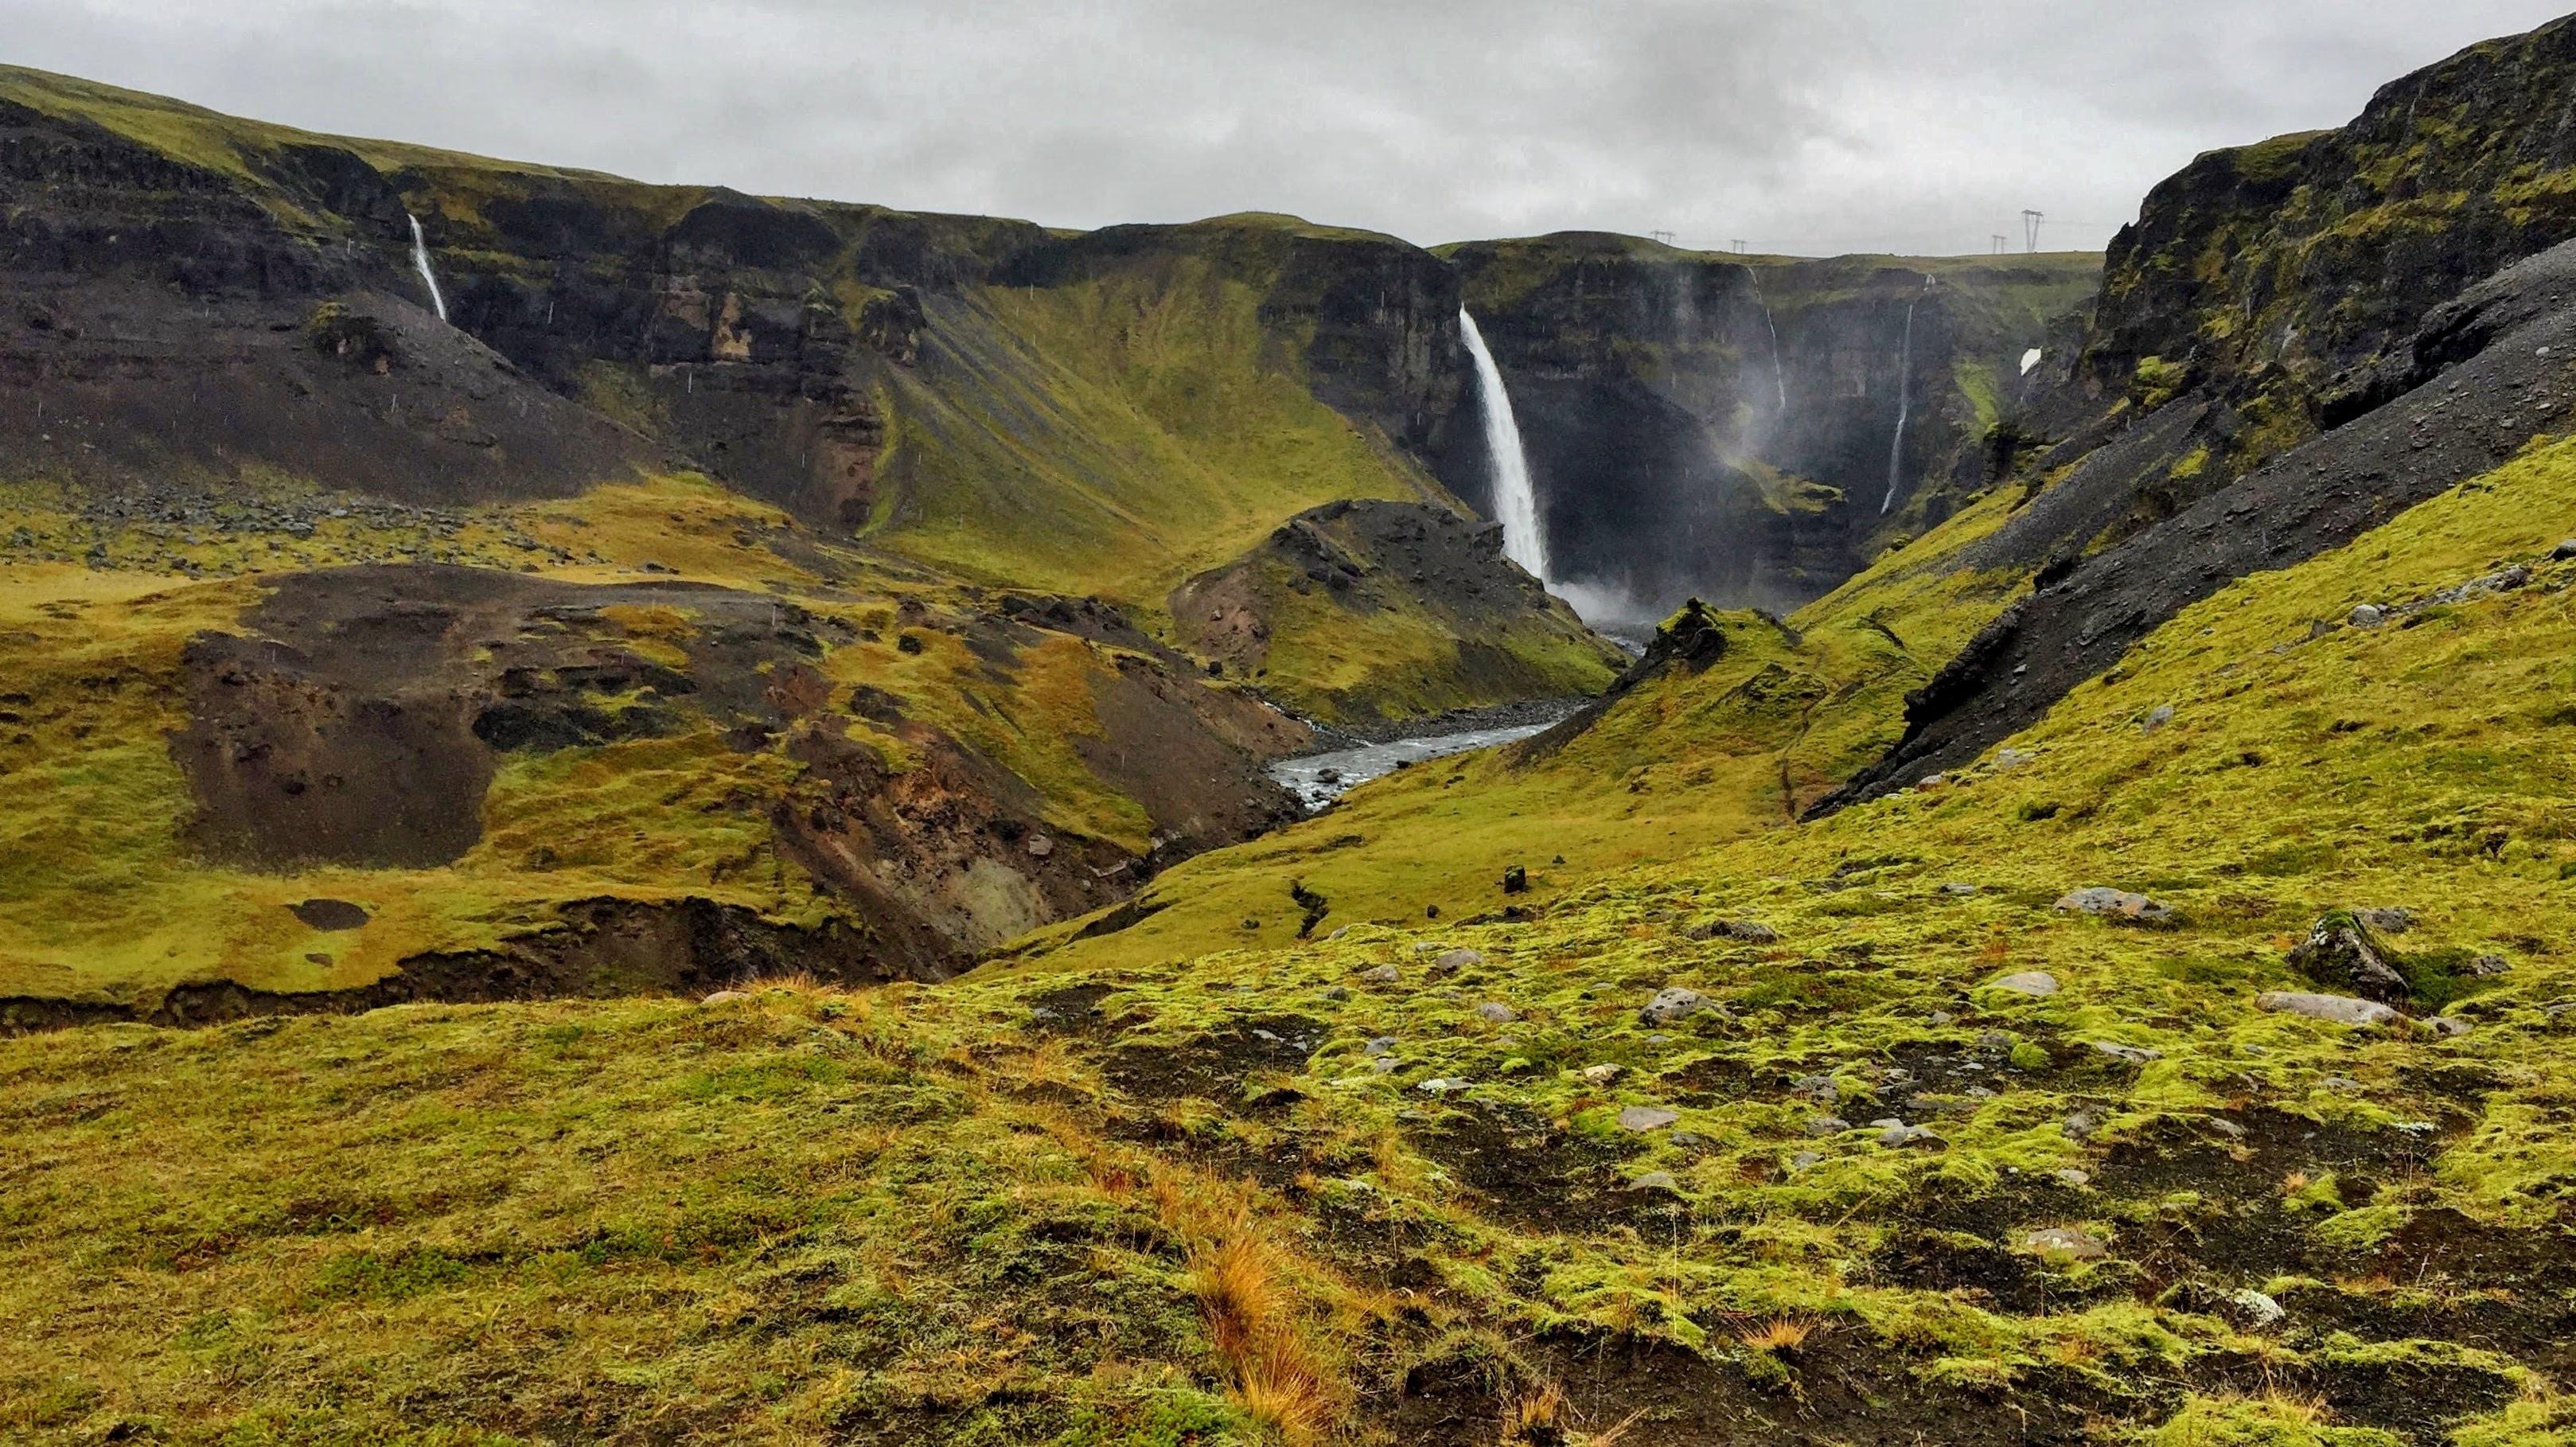 waterfalls near grass field during daytime